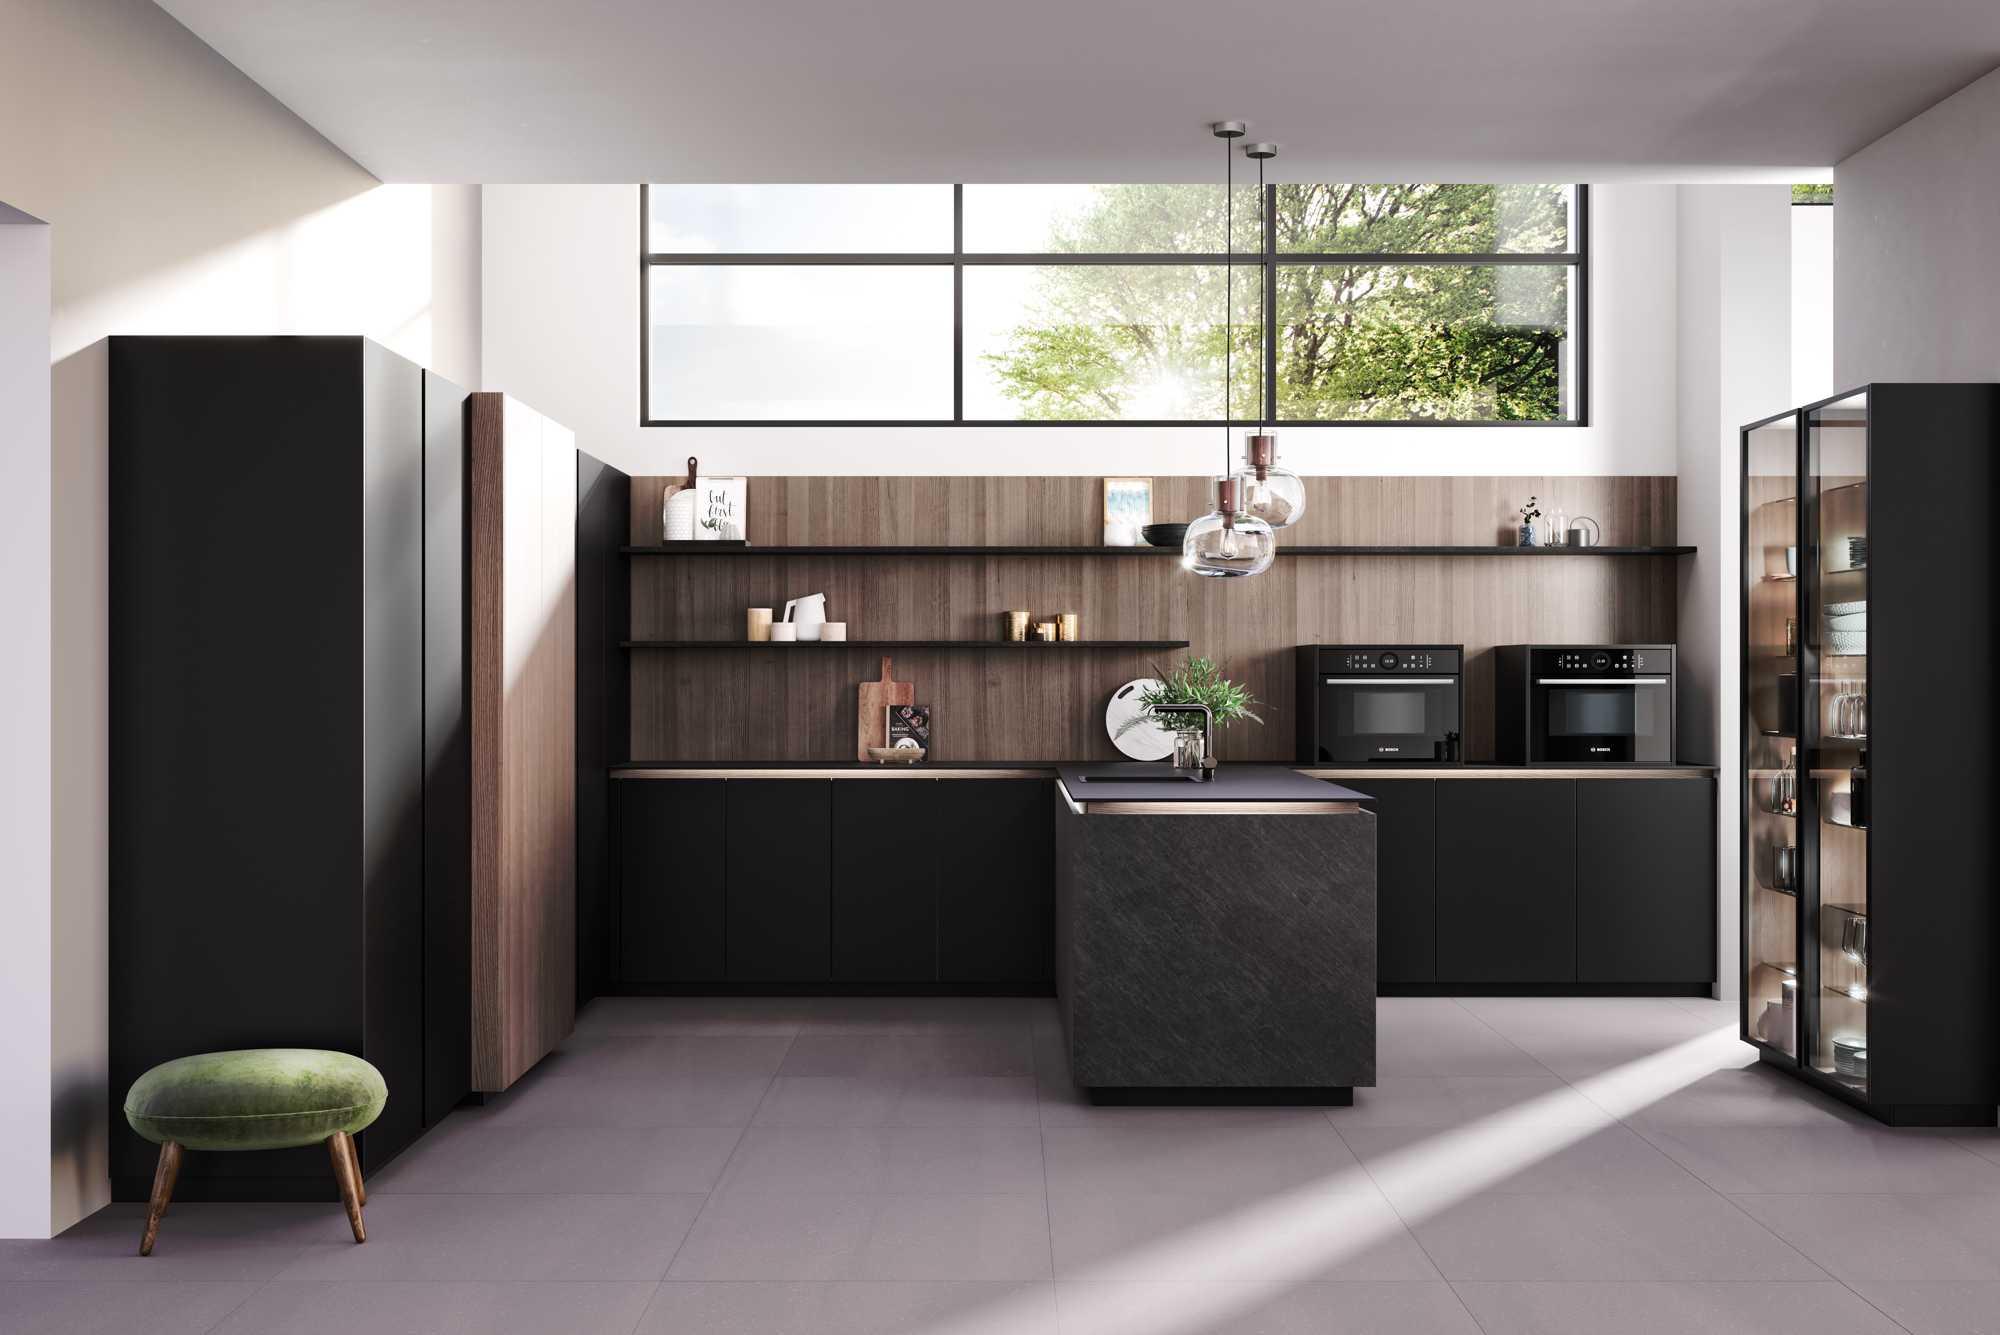 Extravagant True Handleless German kitchen: Ceramica Black Rock, XeroxCity Brown Oak and Fenix Black